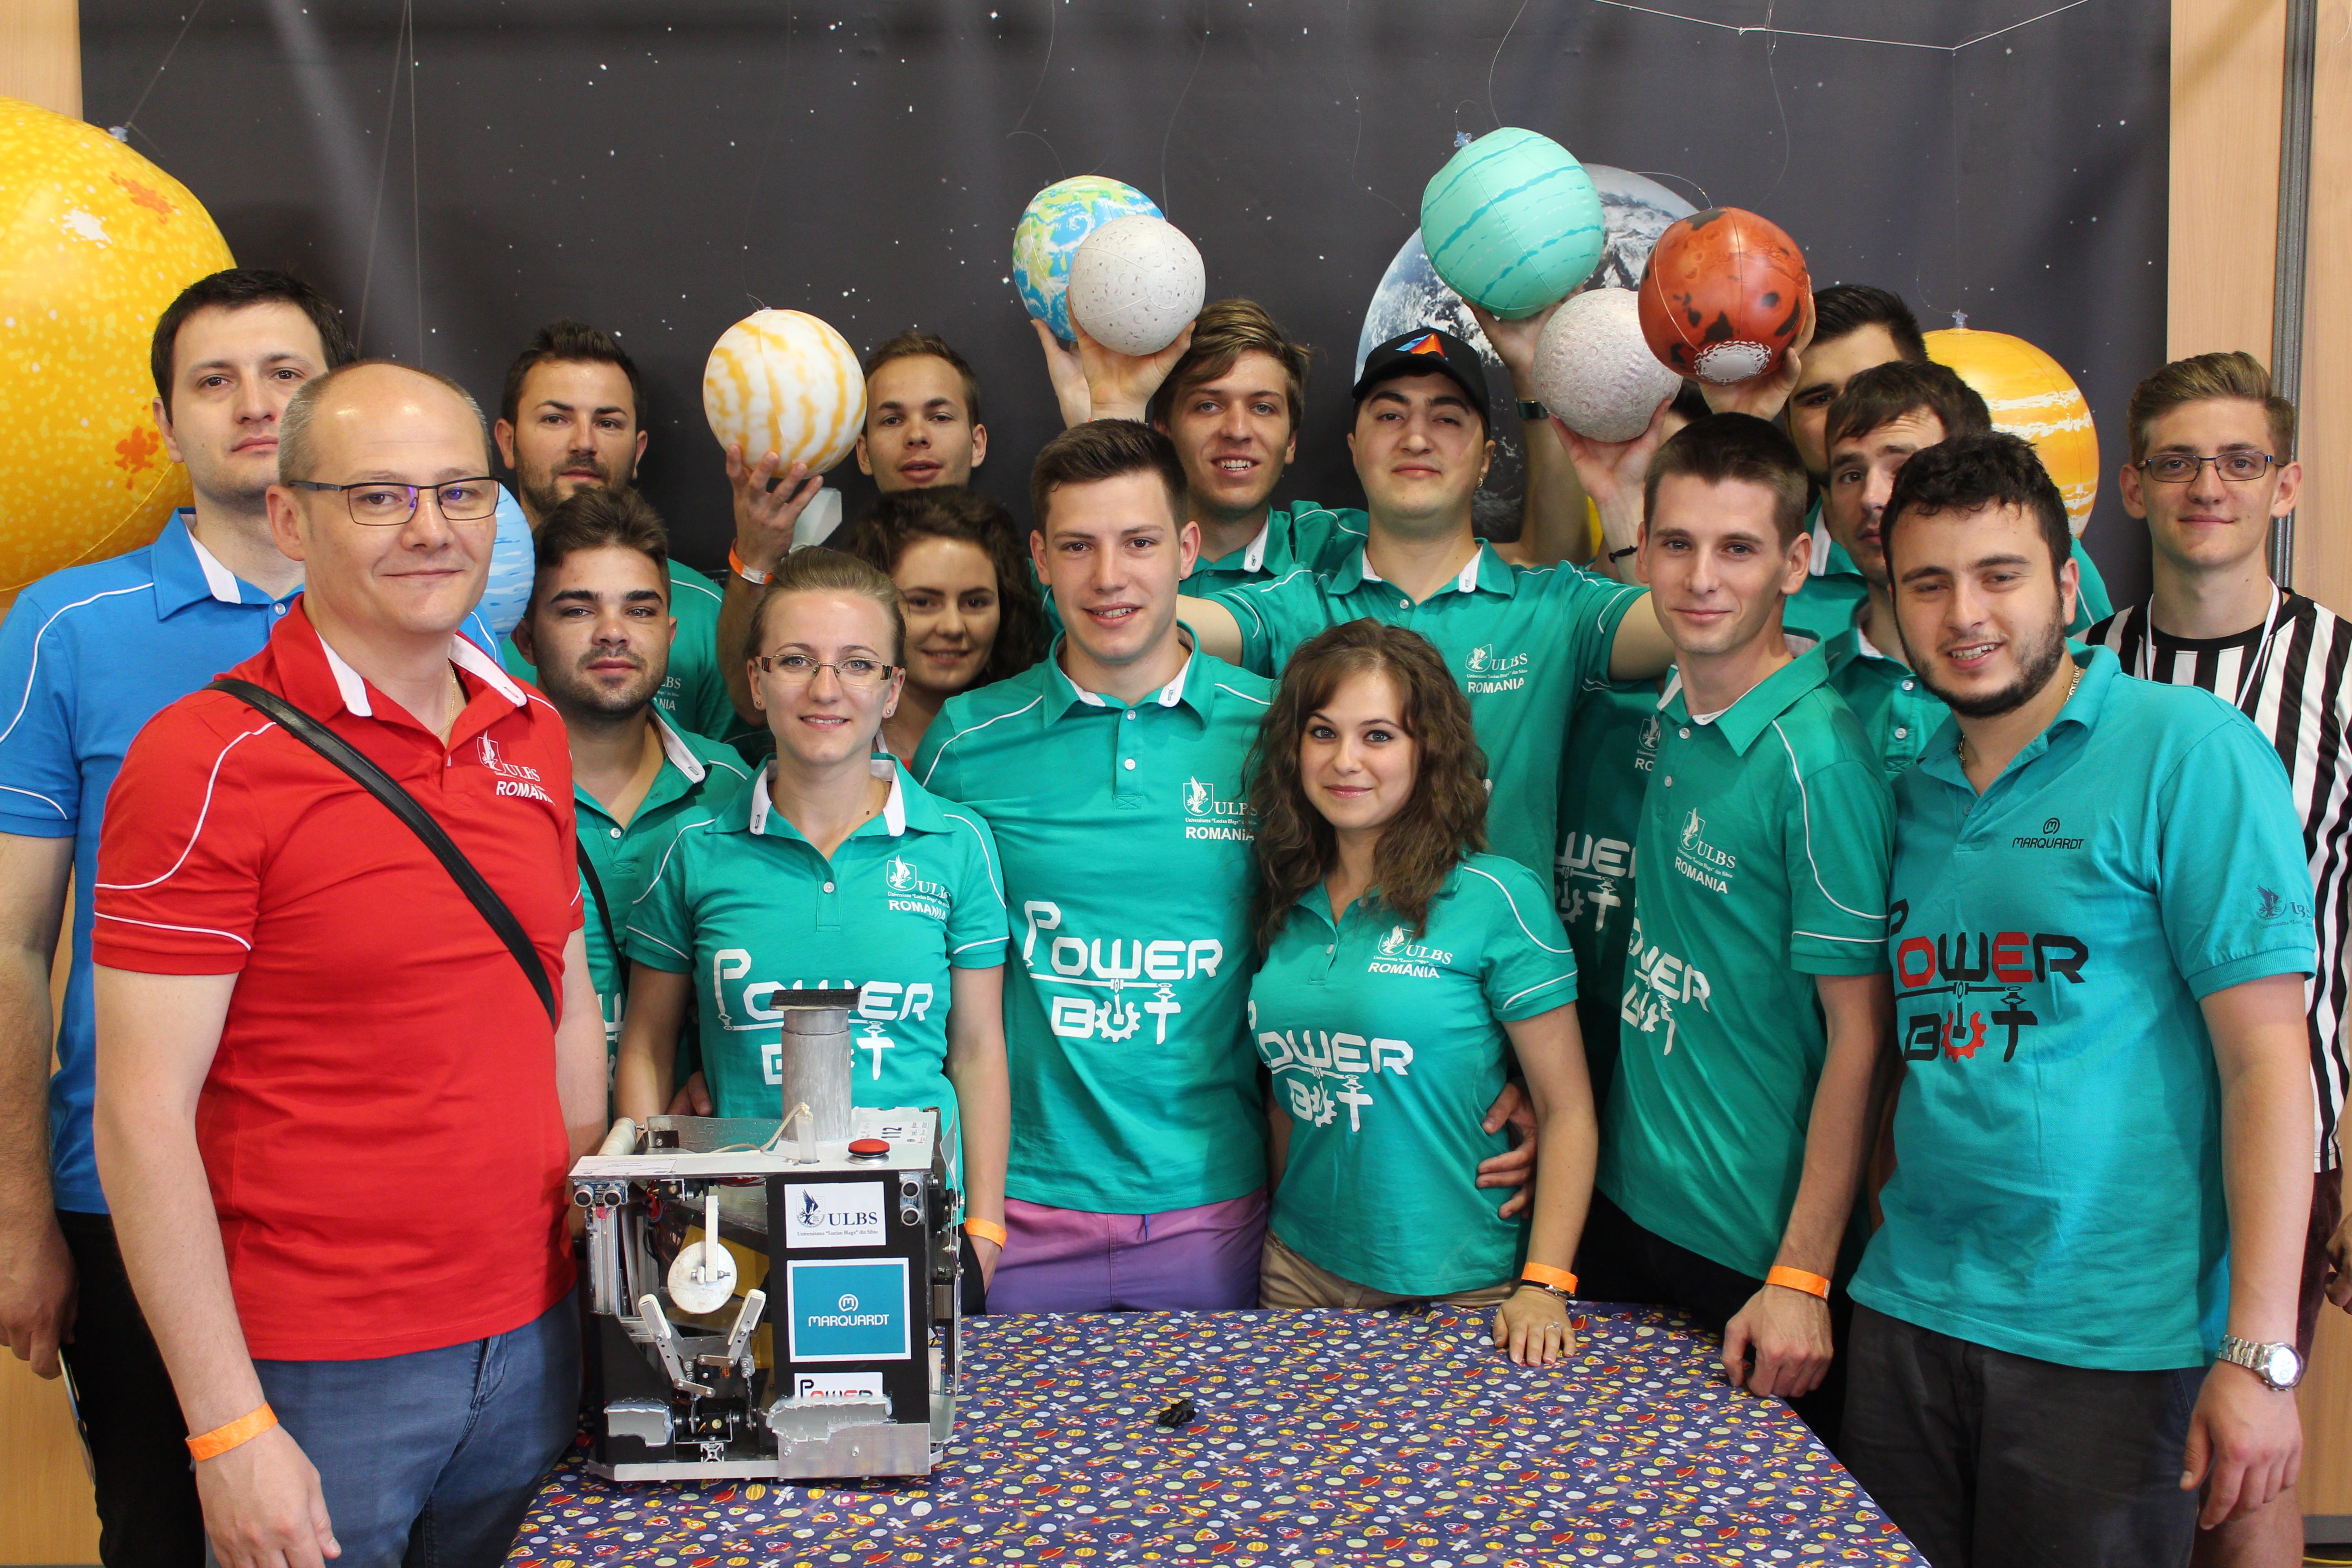 Concursul Internațional De Robotică – EUROBOT 2017